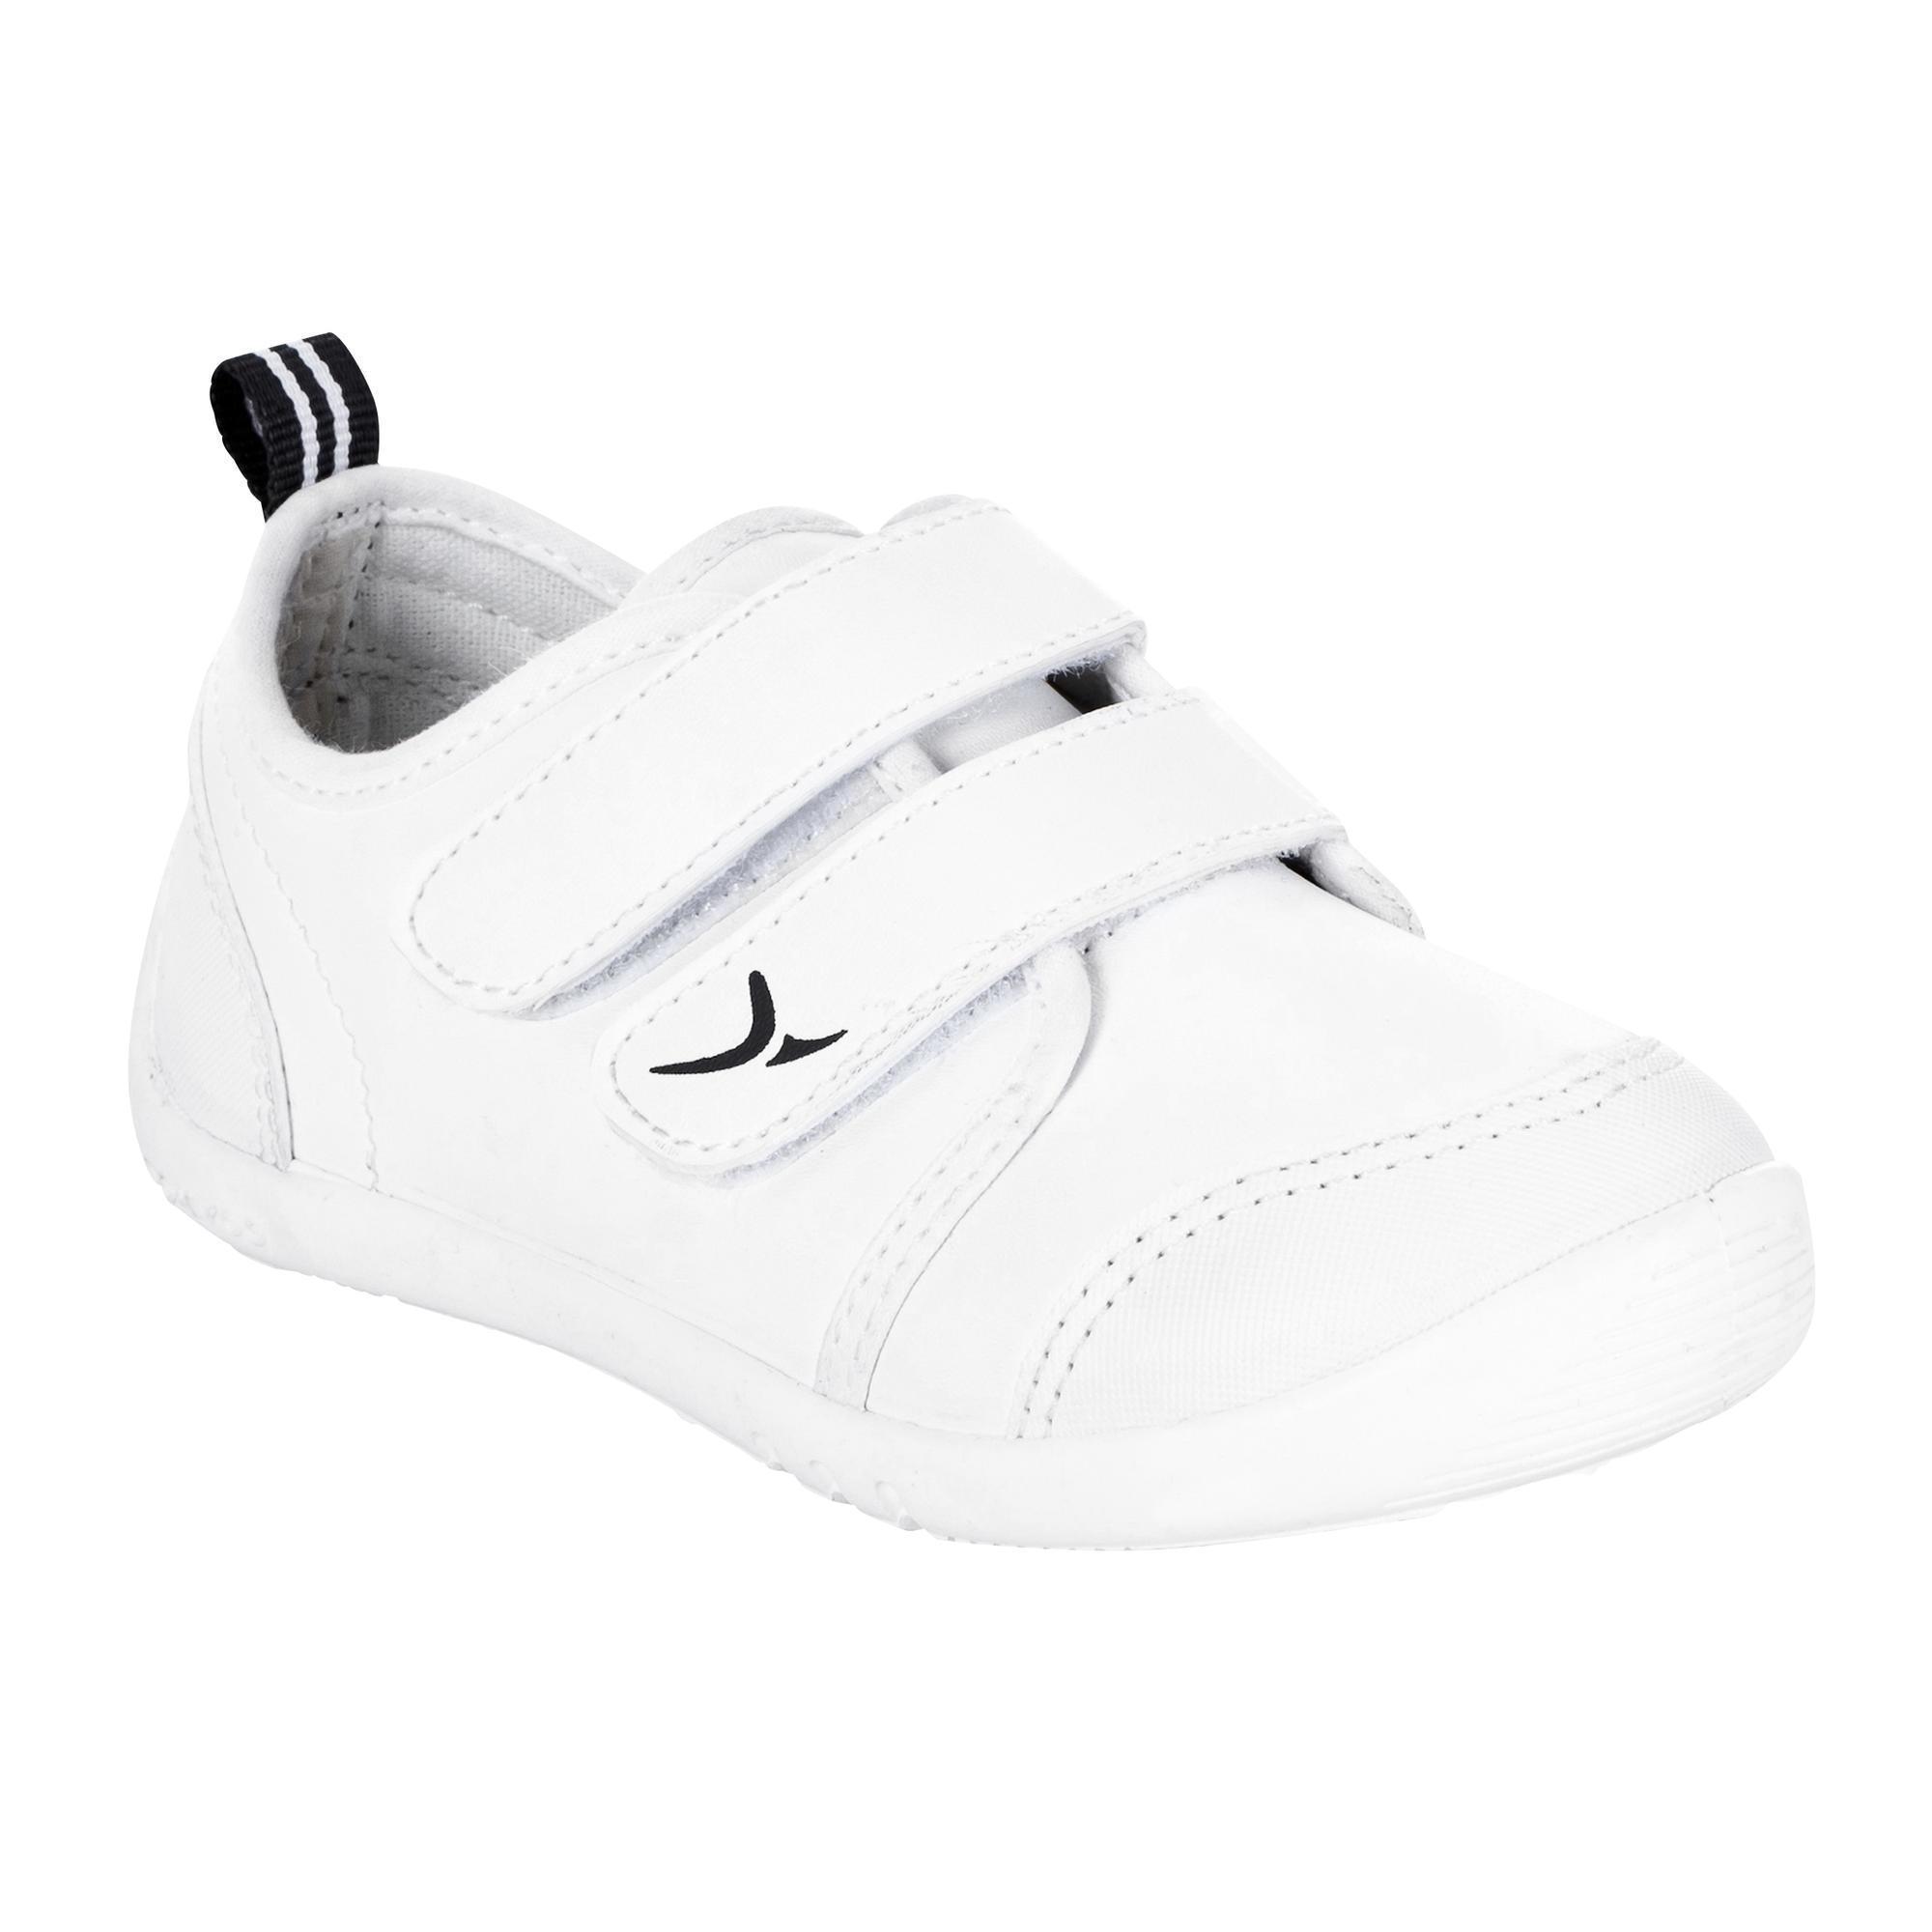 chaussures gym decathlon 88c89fac0eb